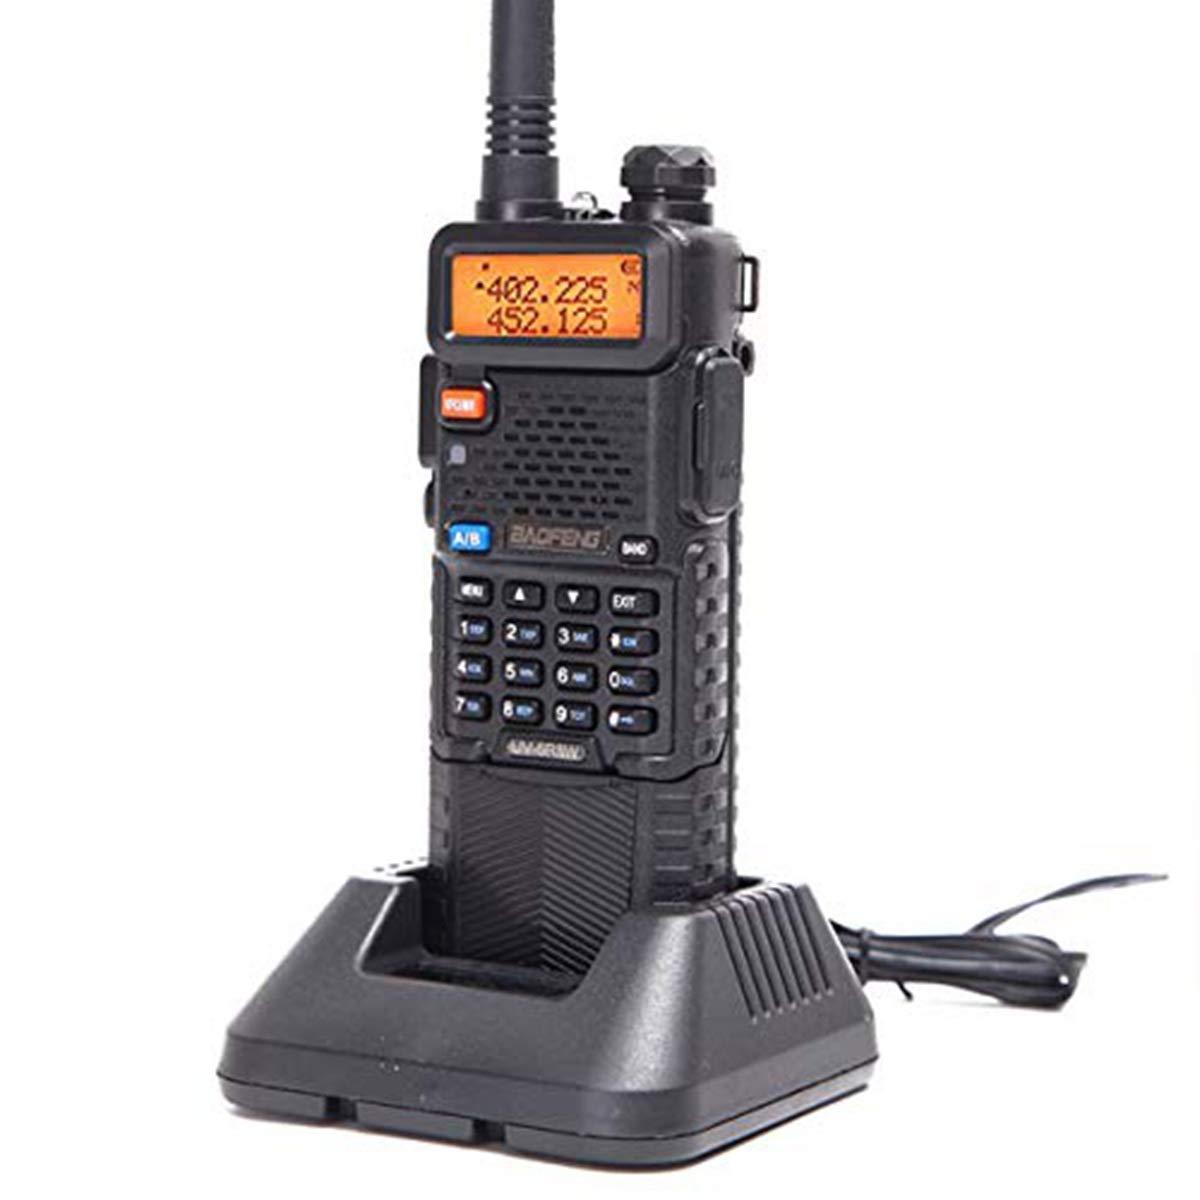 Baofeng UV-5R8W High Power Tri-Power 1W//4W//8W Portable Dual Band Two-Way Radio 3800mAh Battery /& Tactical Antenna